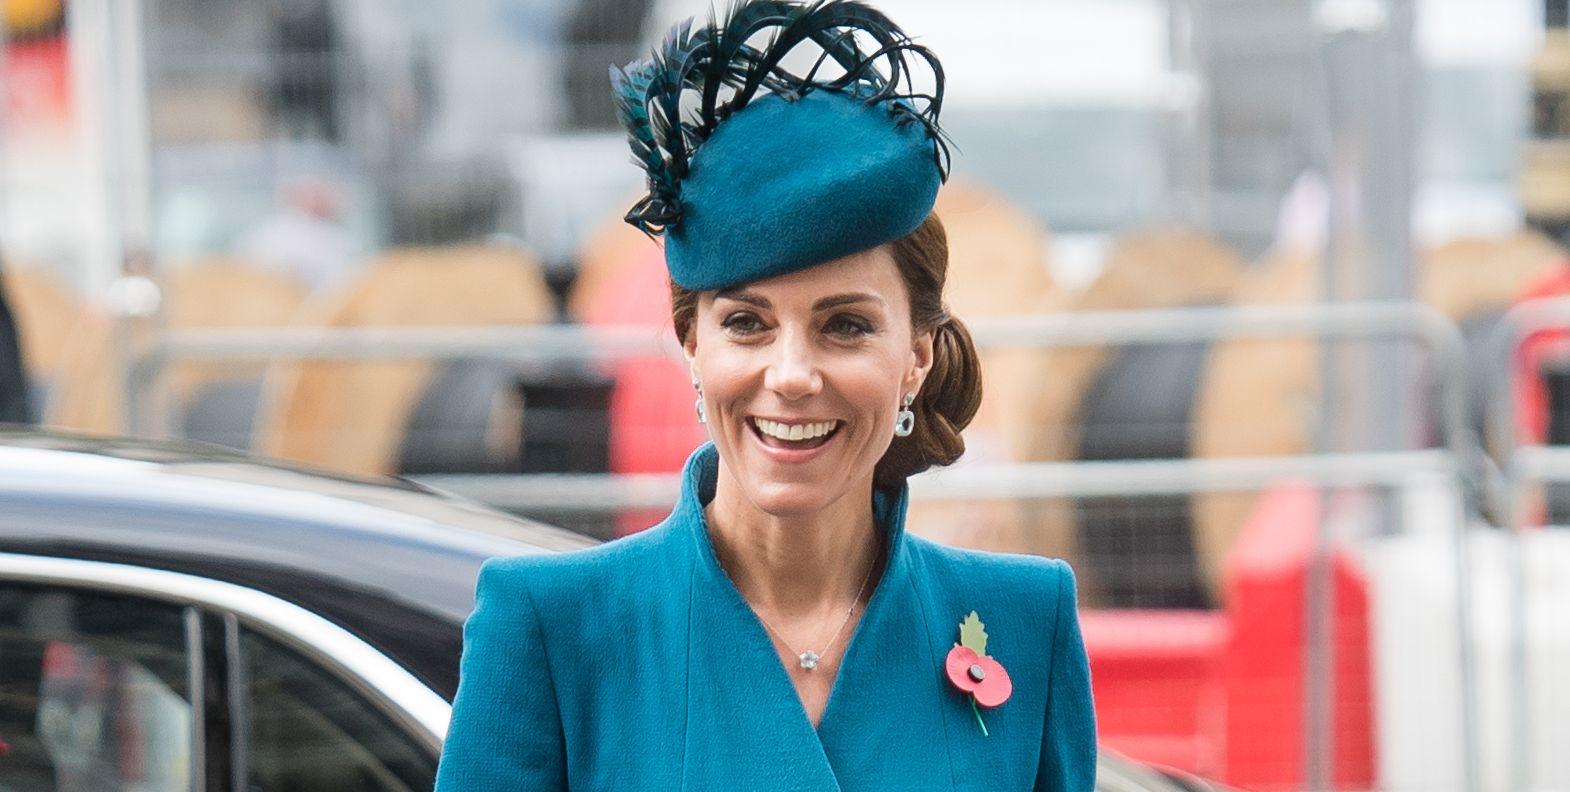 Duchess Of Cambridge Attends ANZAC Day Service